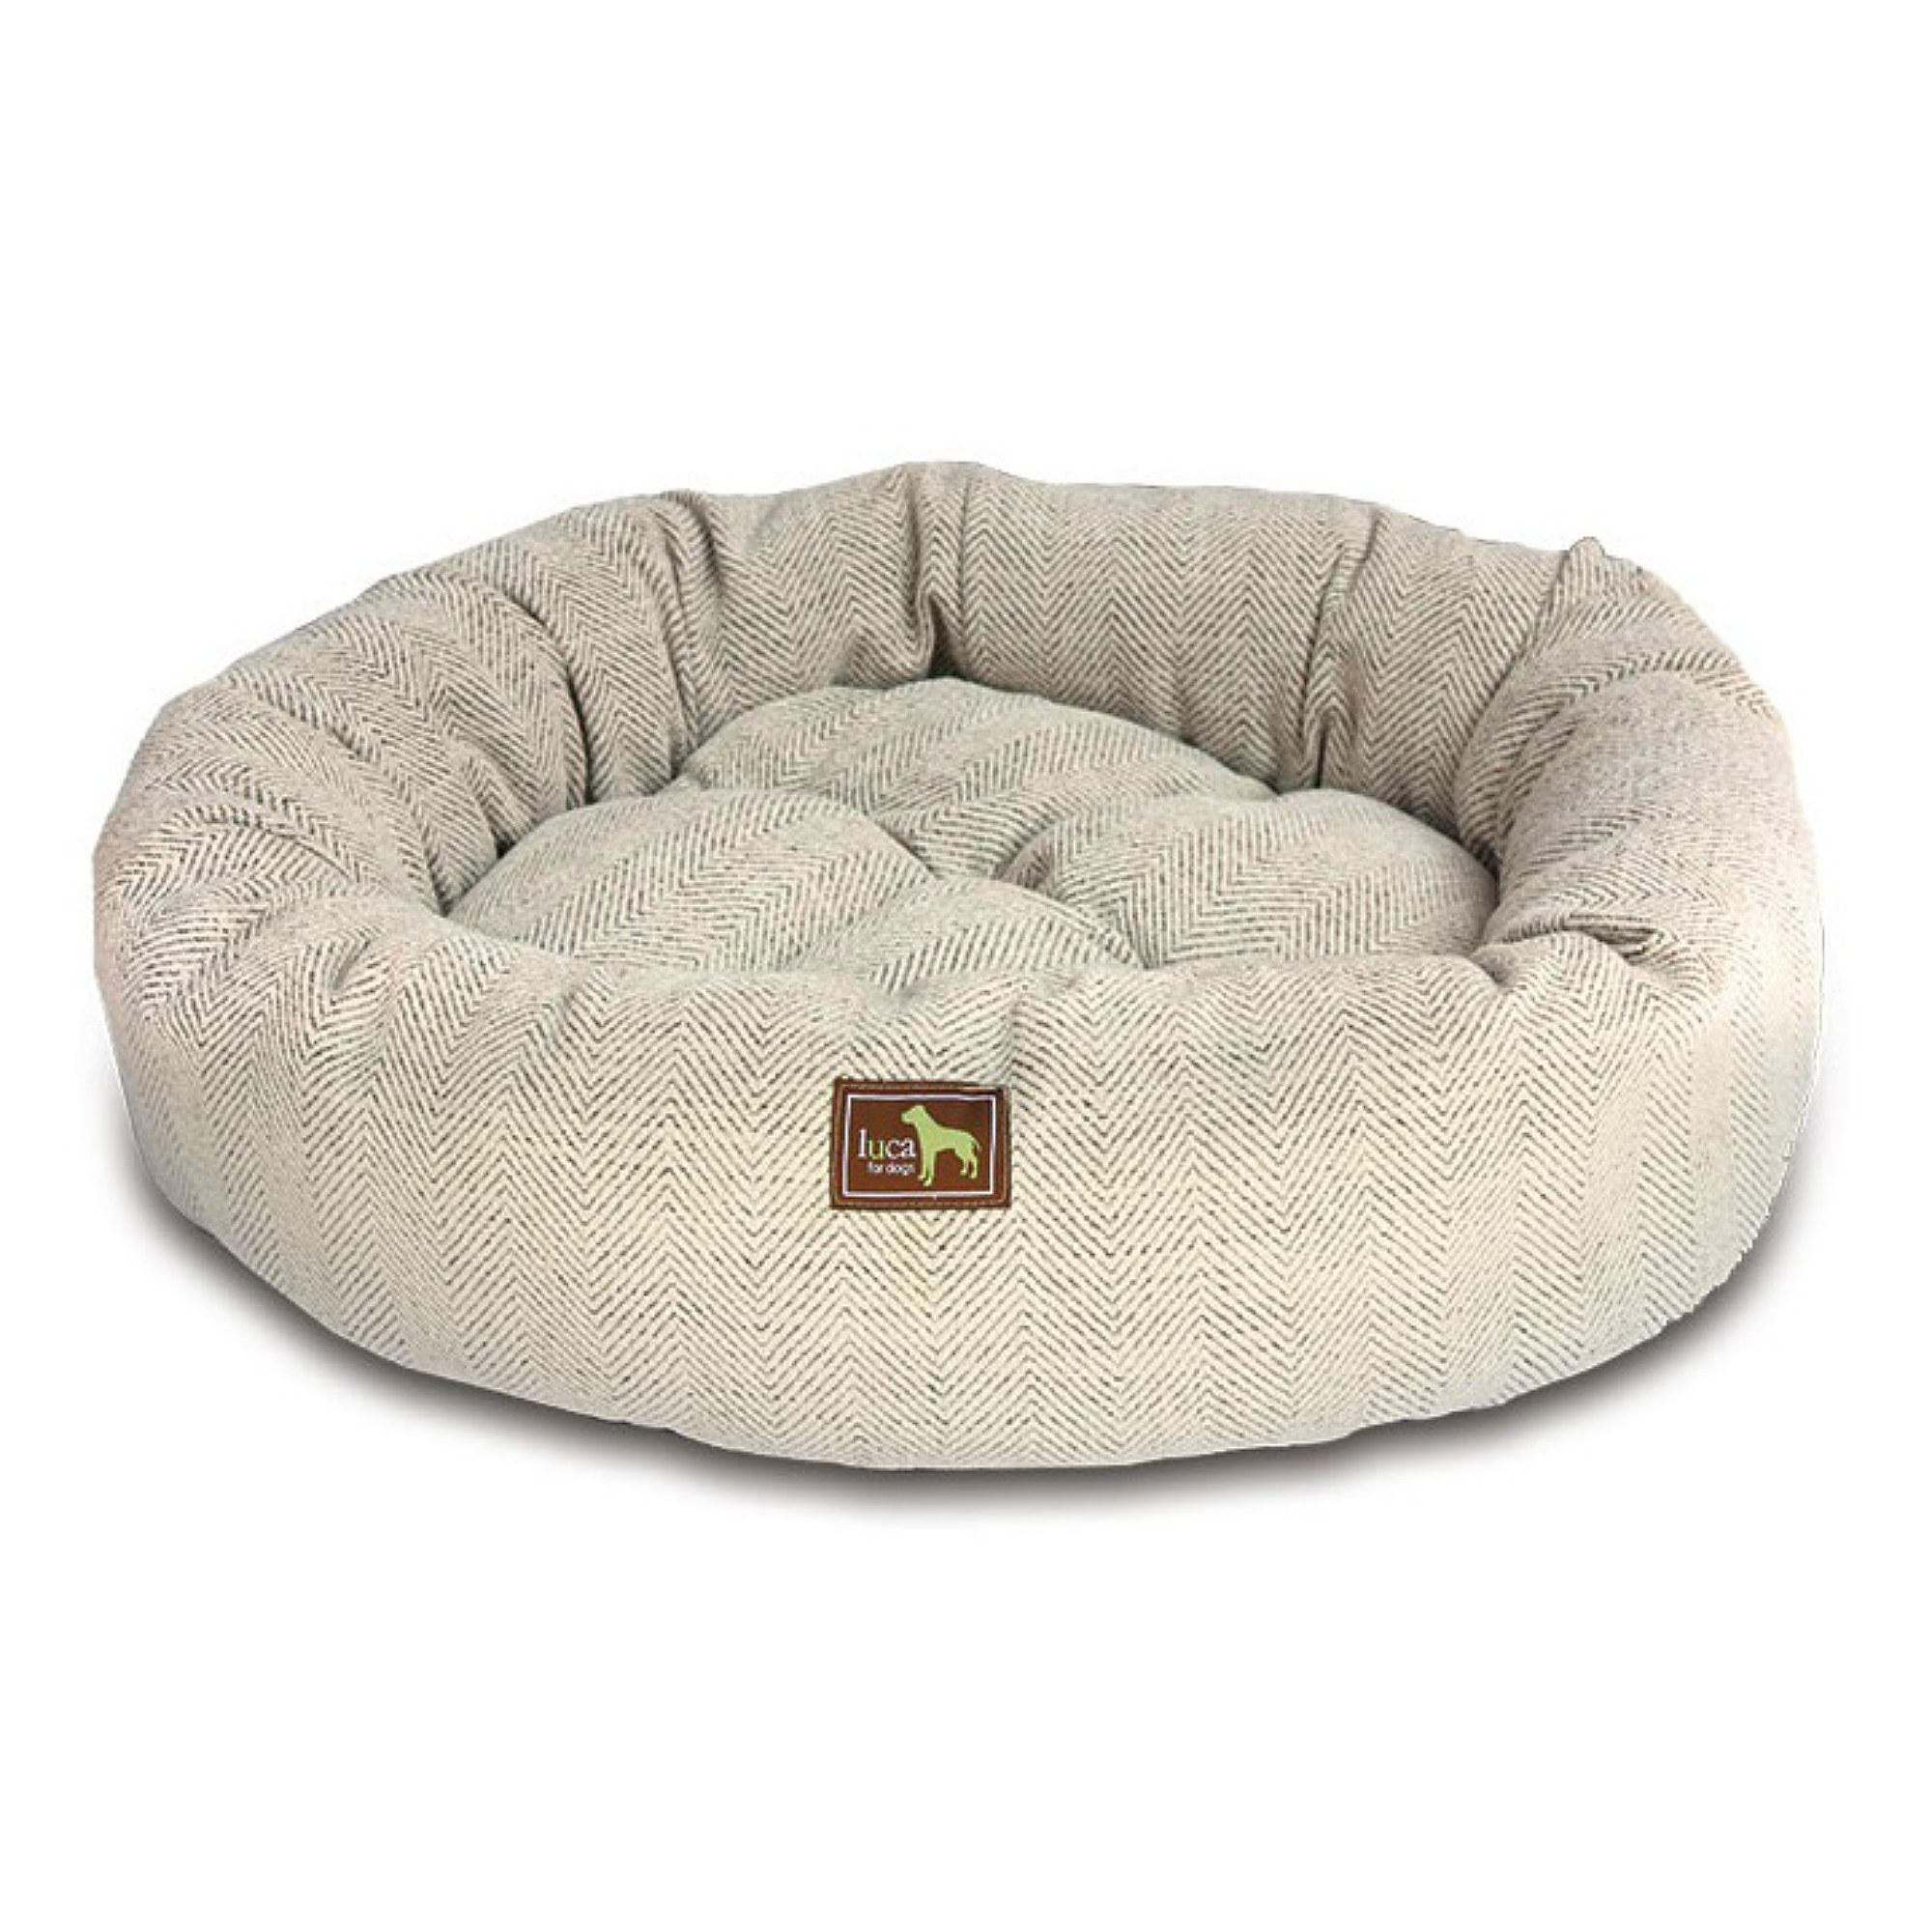 Luca Nest Dog Bed - Oyster Tweed